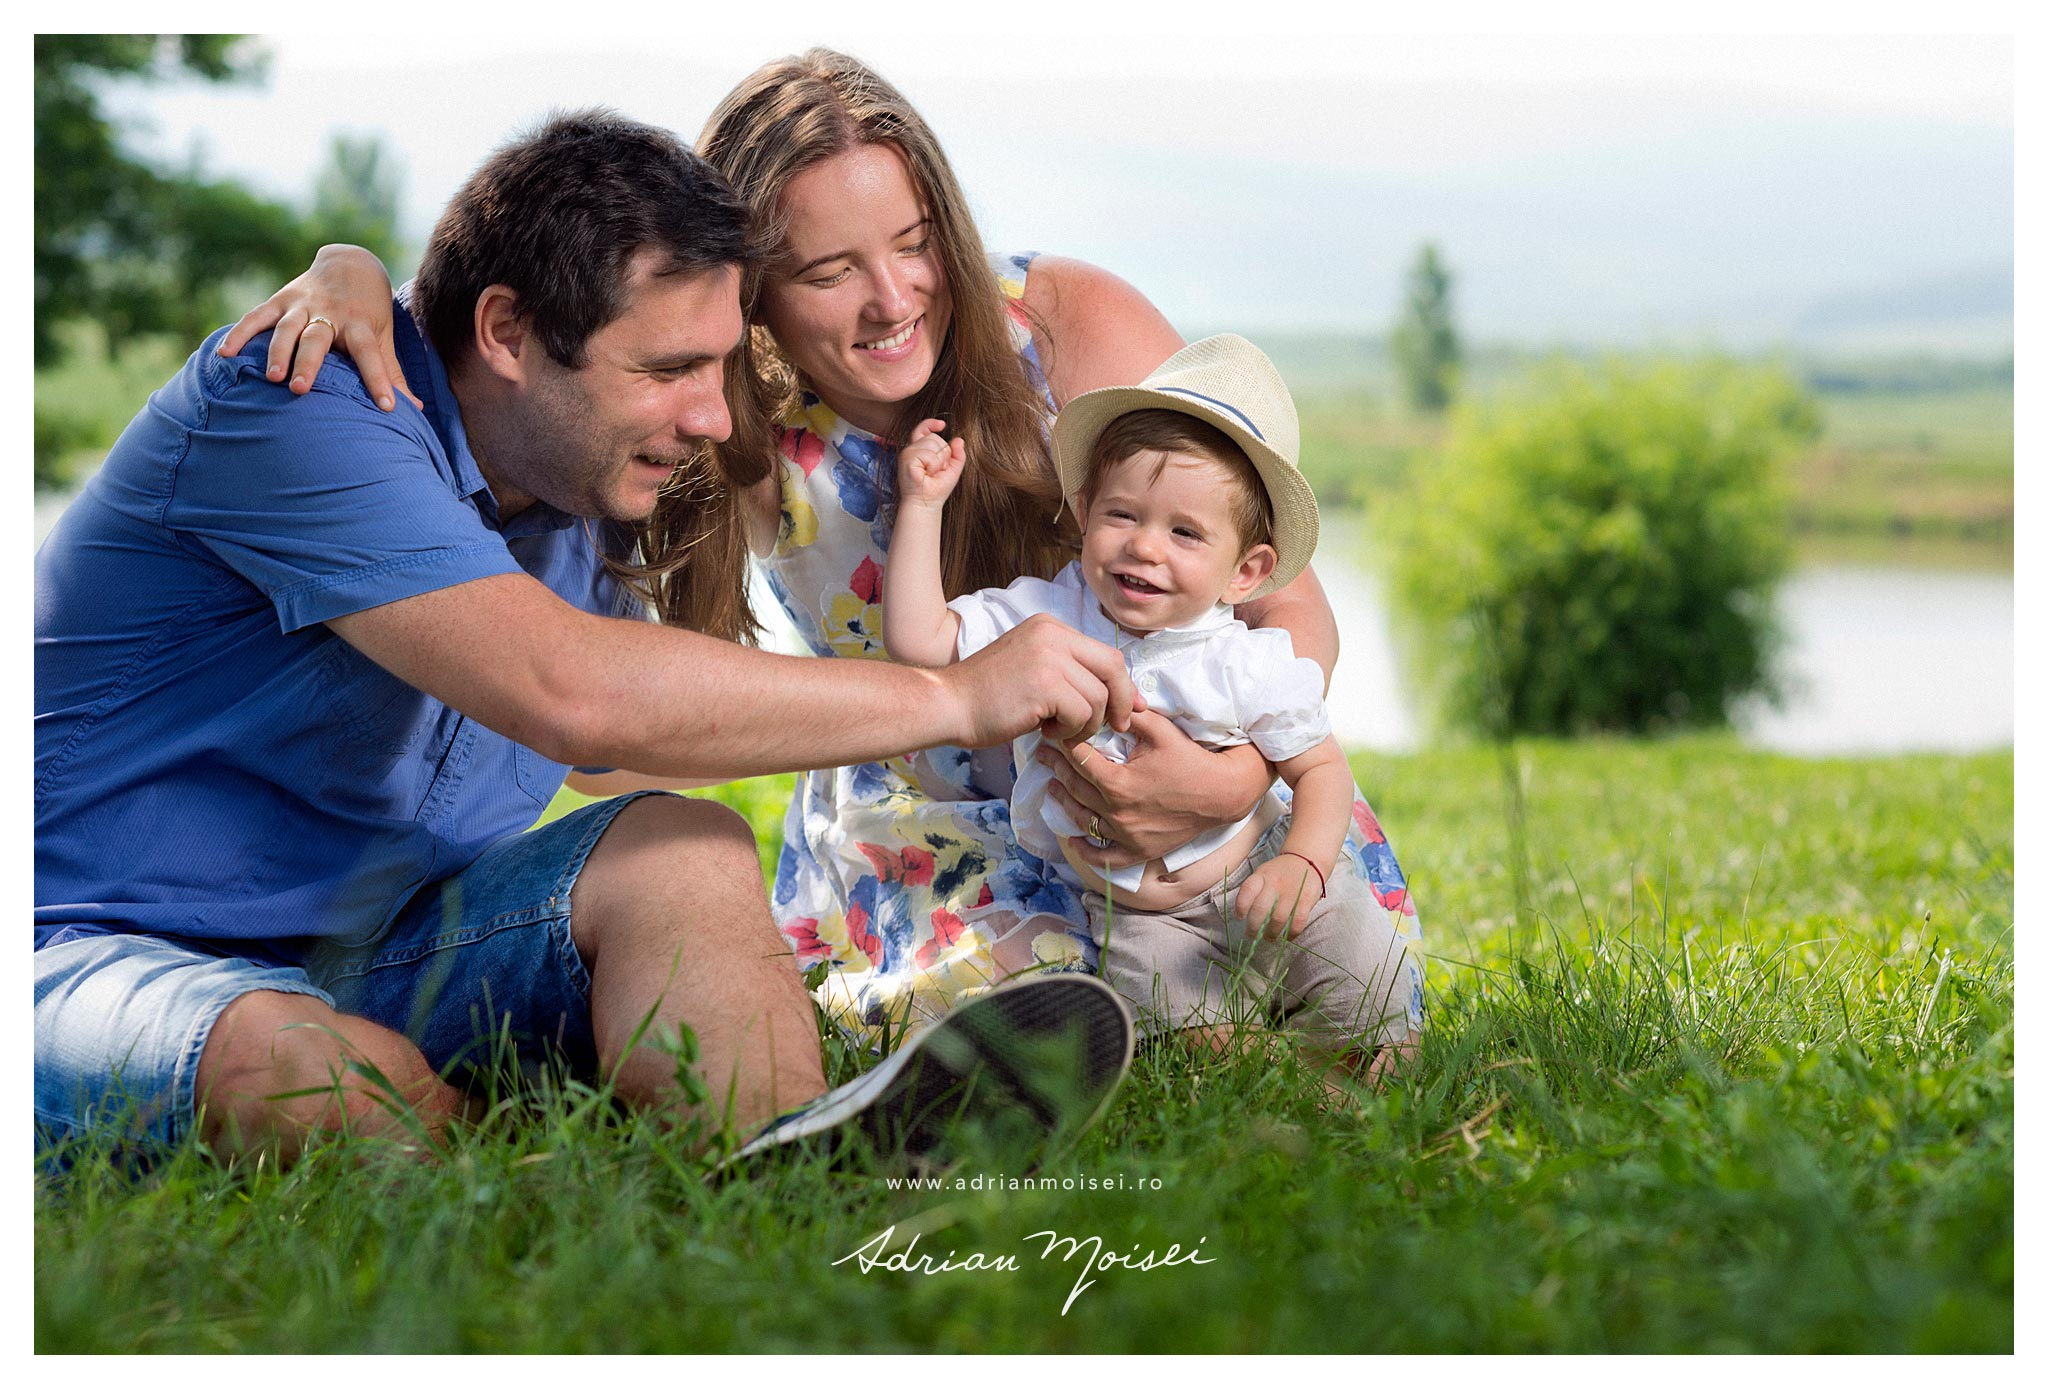 Fotograf familie Iasi, Adrian Moisei. Portrete copilas in natura langa lac, intr-o zi calduroasa de vara